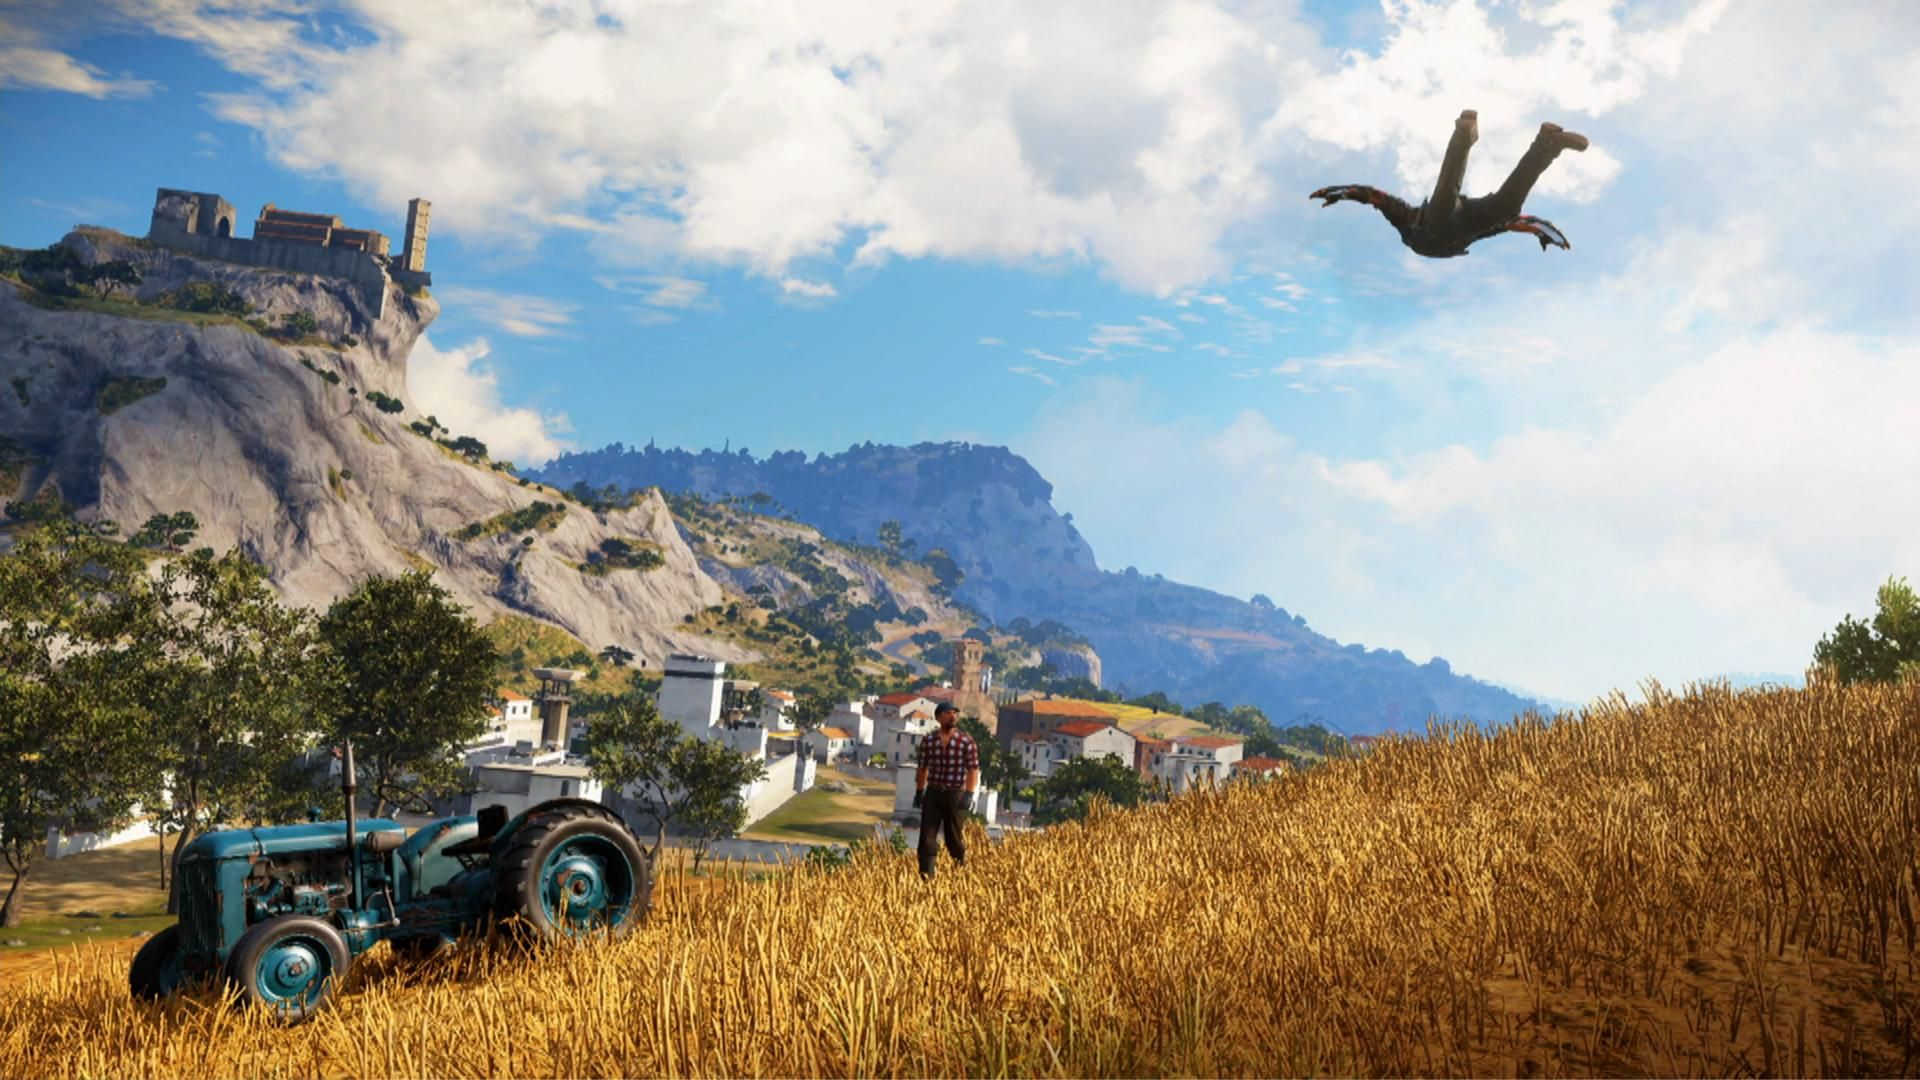 New Just Cause 3 Screenshots Shows Off Its Beautiful Mediterranean Setting Lightning Gaming News Just Cause 3 Phone Wallpaper Wallpaper